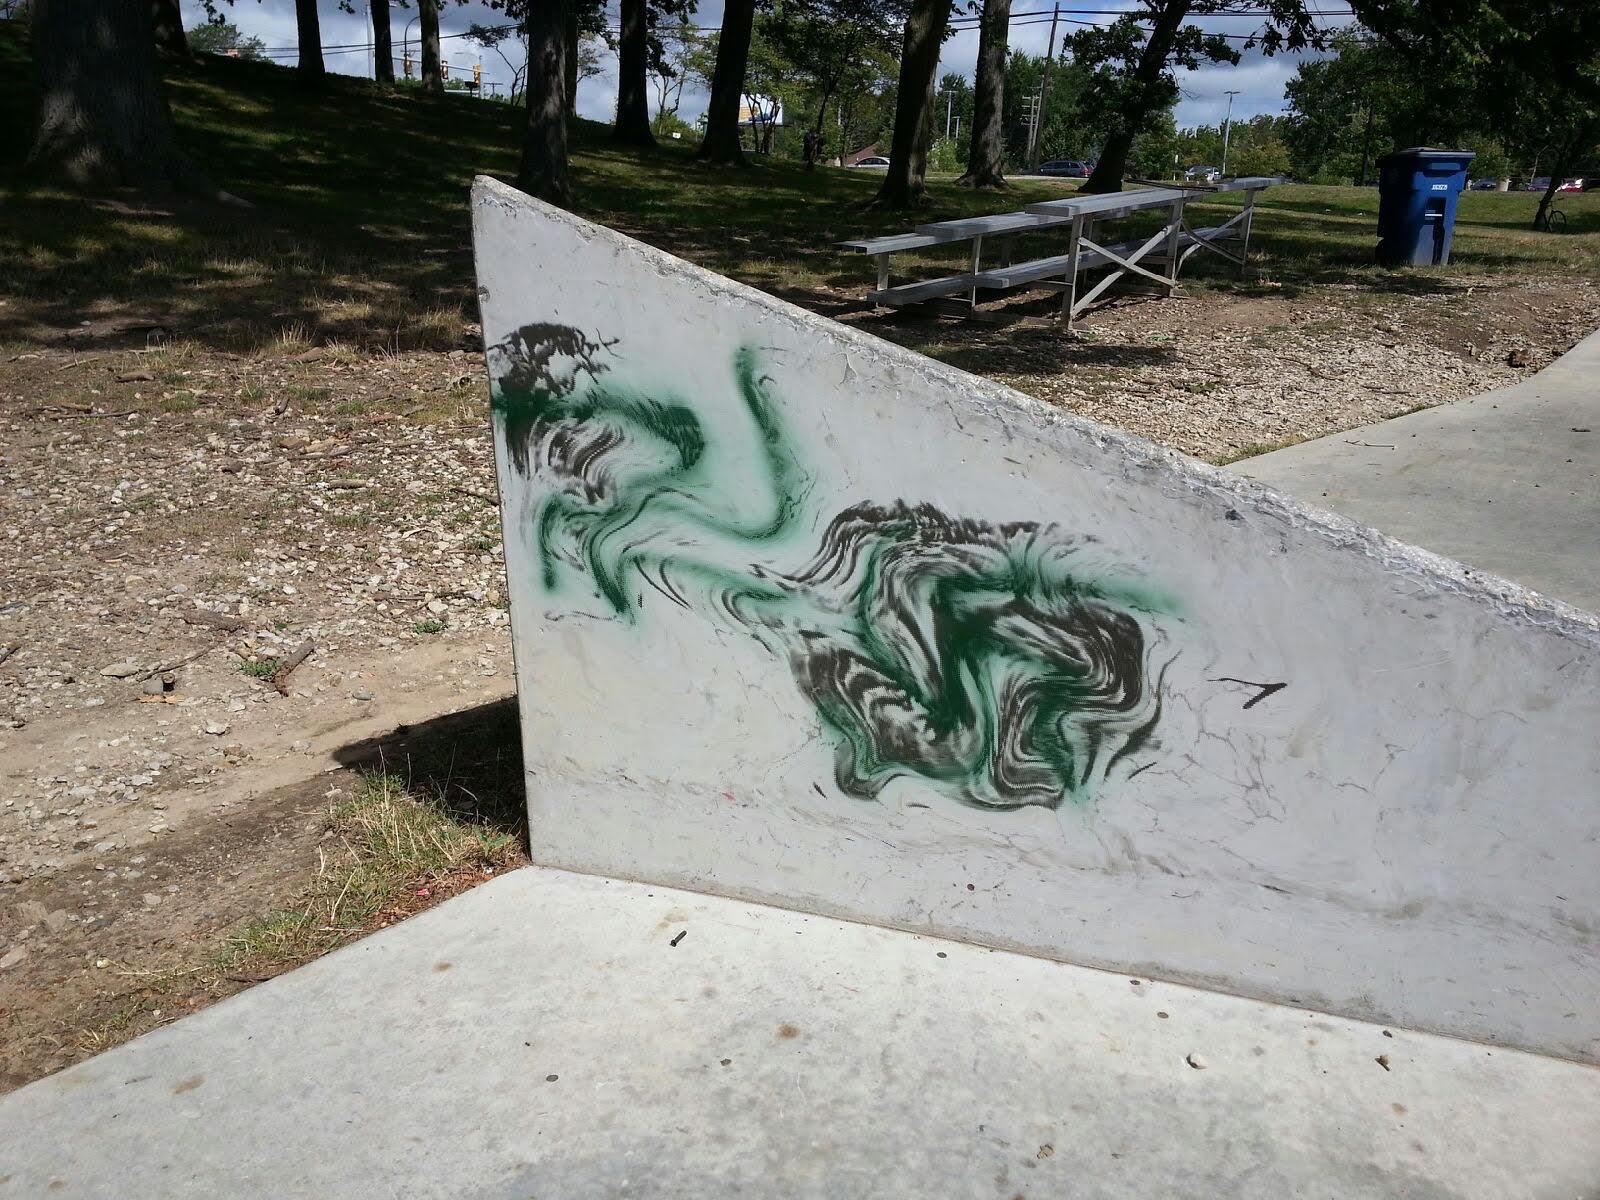 Graffiti wall ann arbor - Ann Arbor City Council Adding Racist Graffiti Incident To Its Agenda For Tonight S Meeting